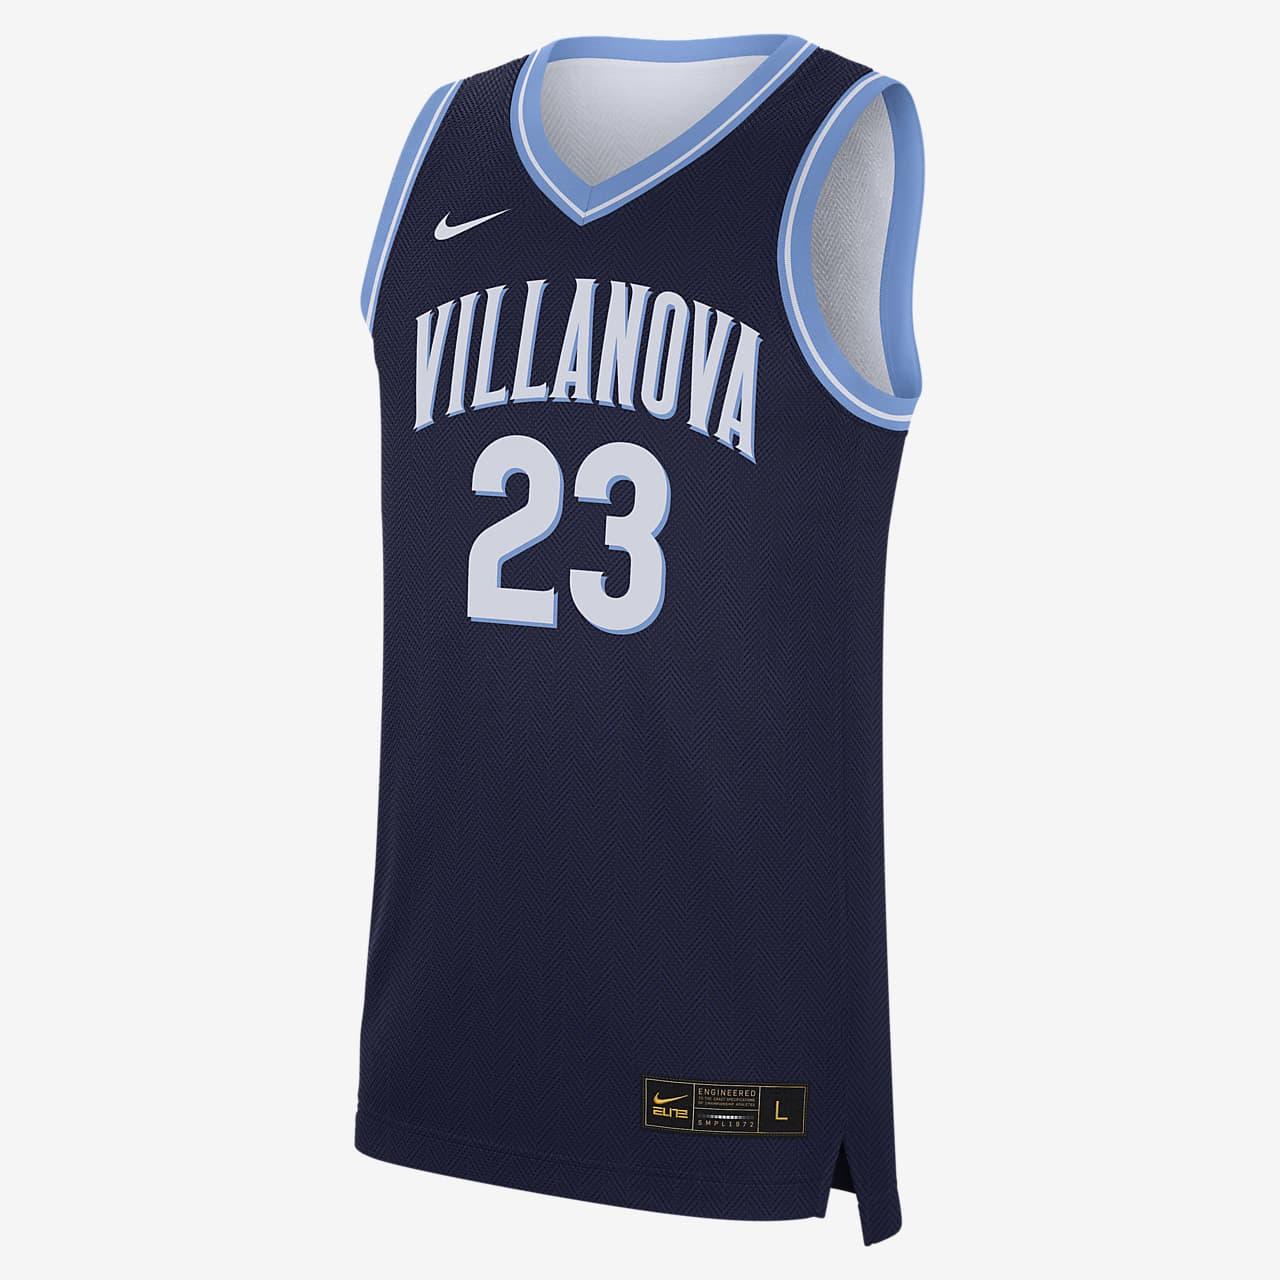 Nike College Replica (Villanova) Men's Basketball Jersey